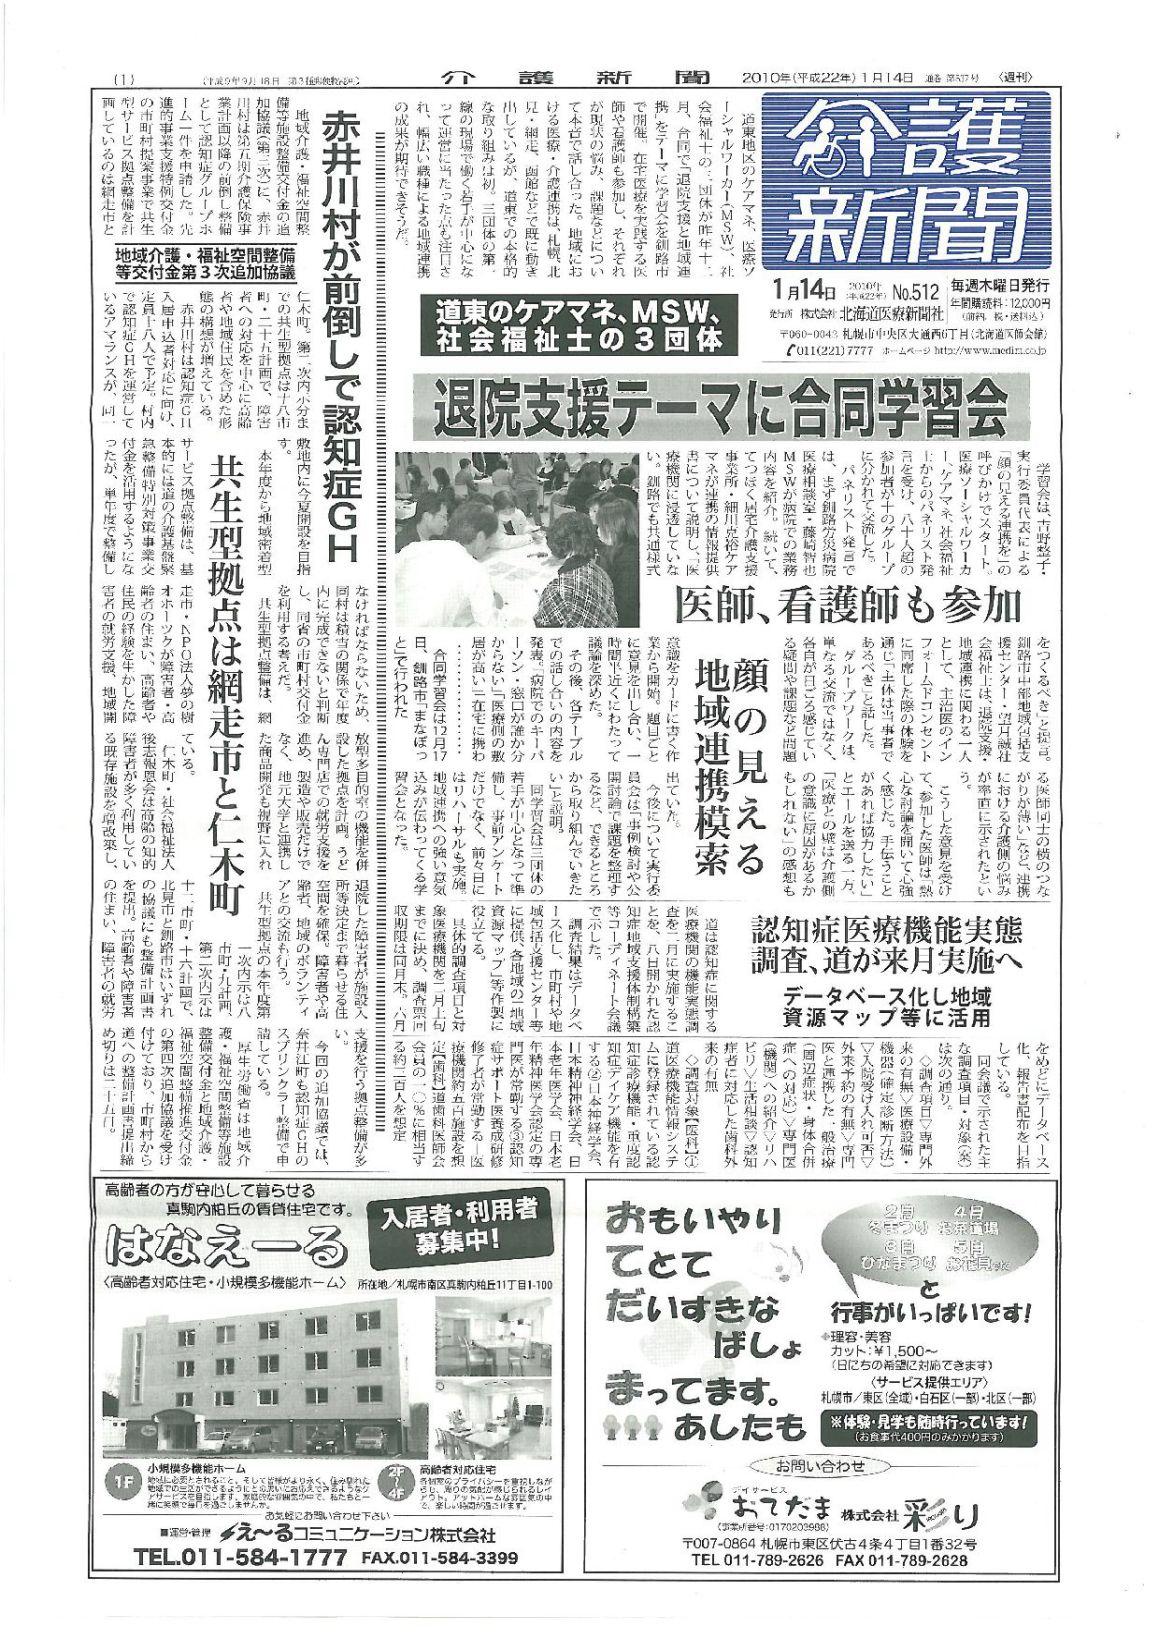 介護新聞2010年1月14日